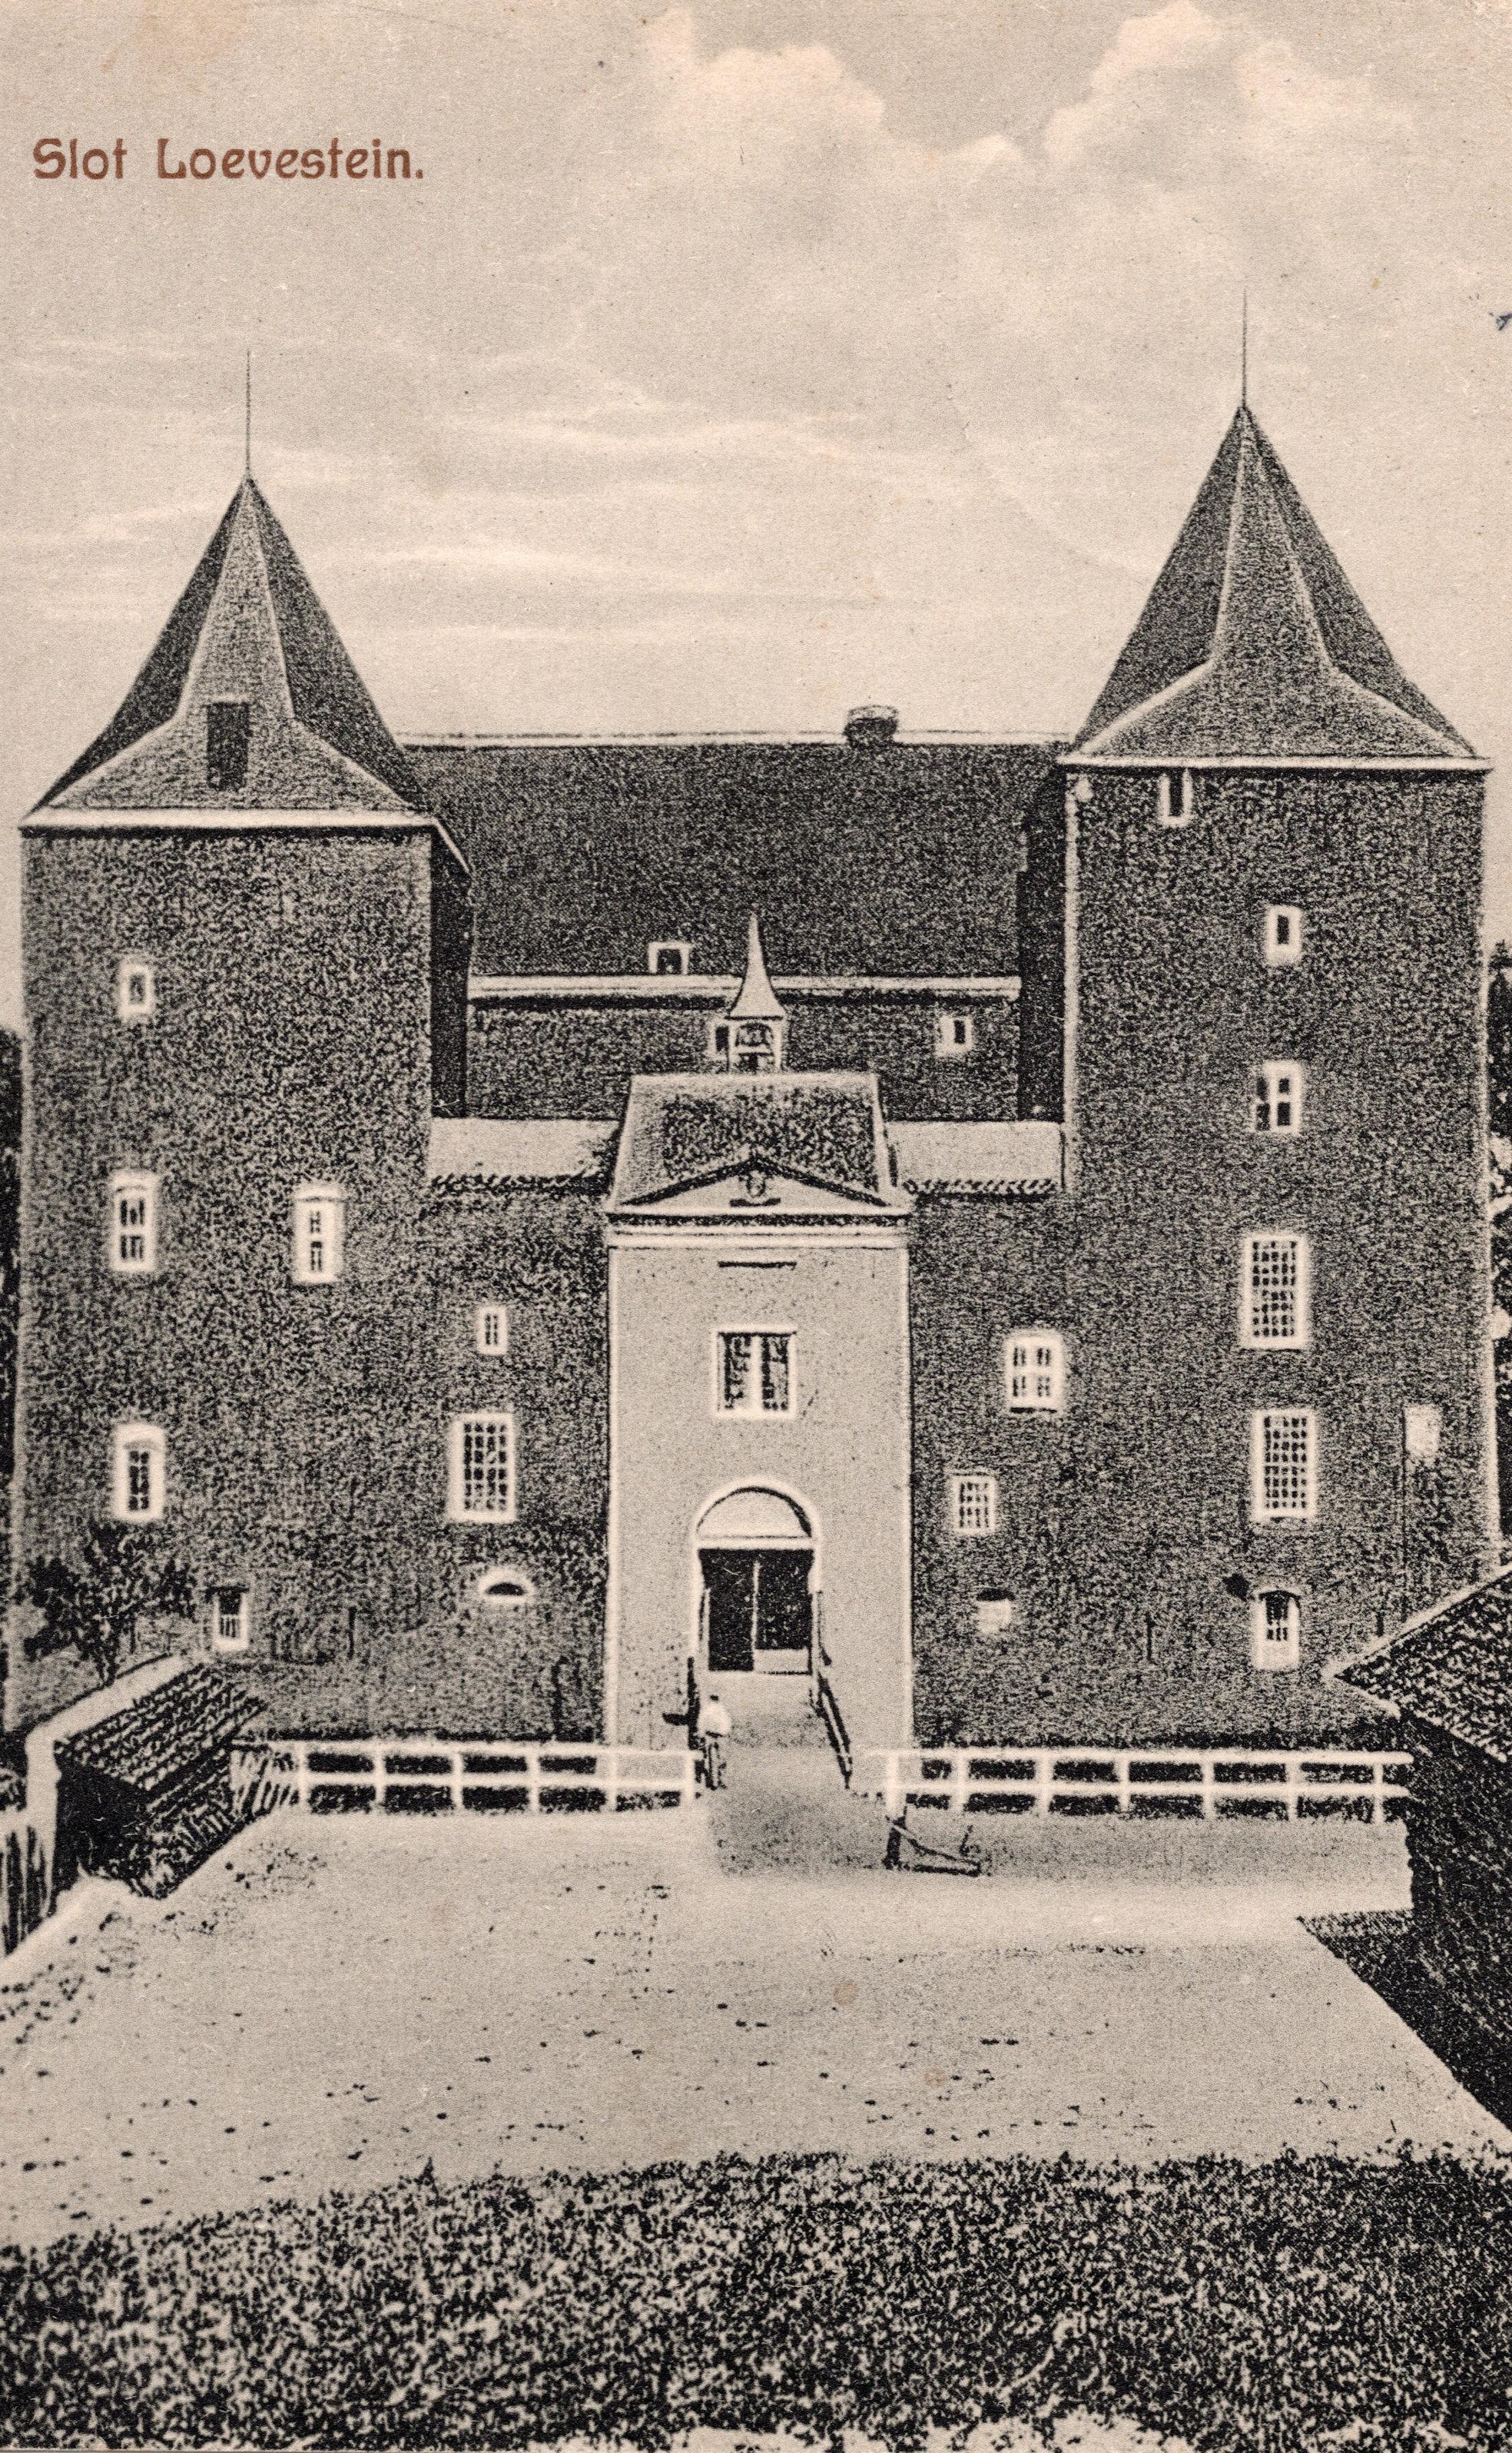 A5-Slot-Loevestein-1917